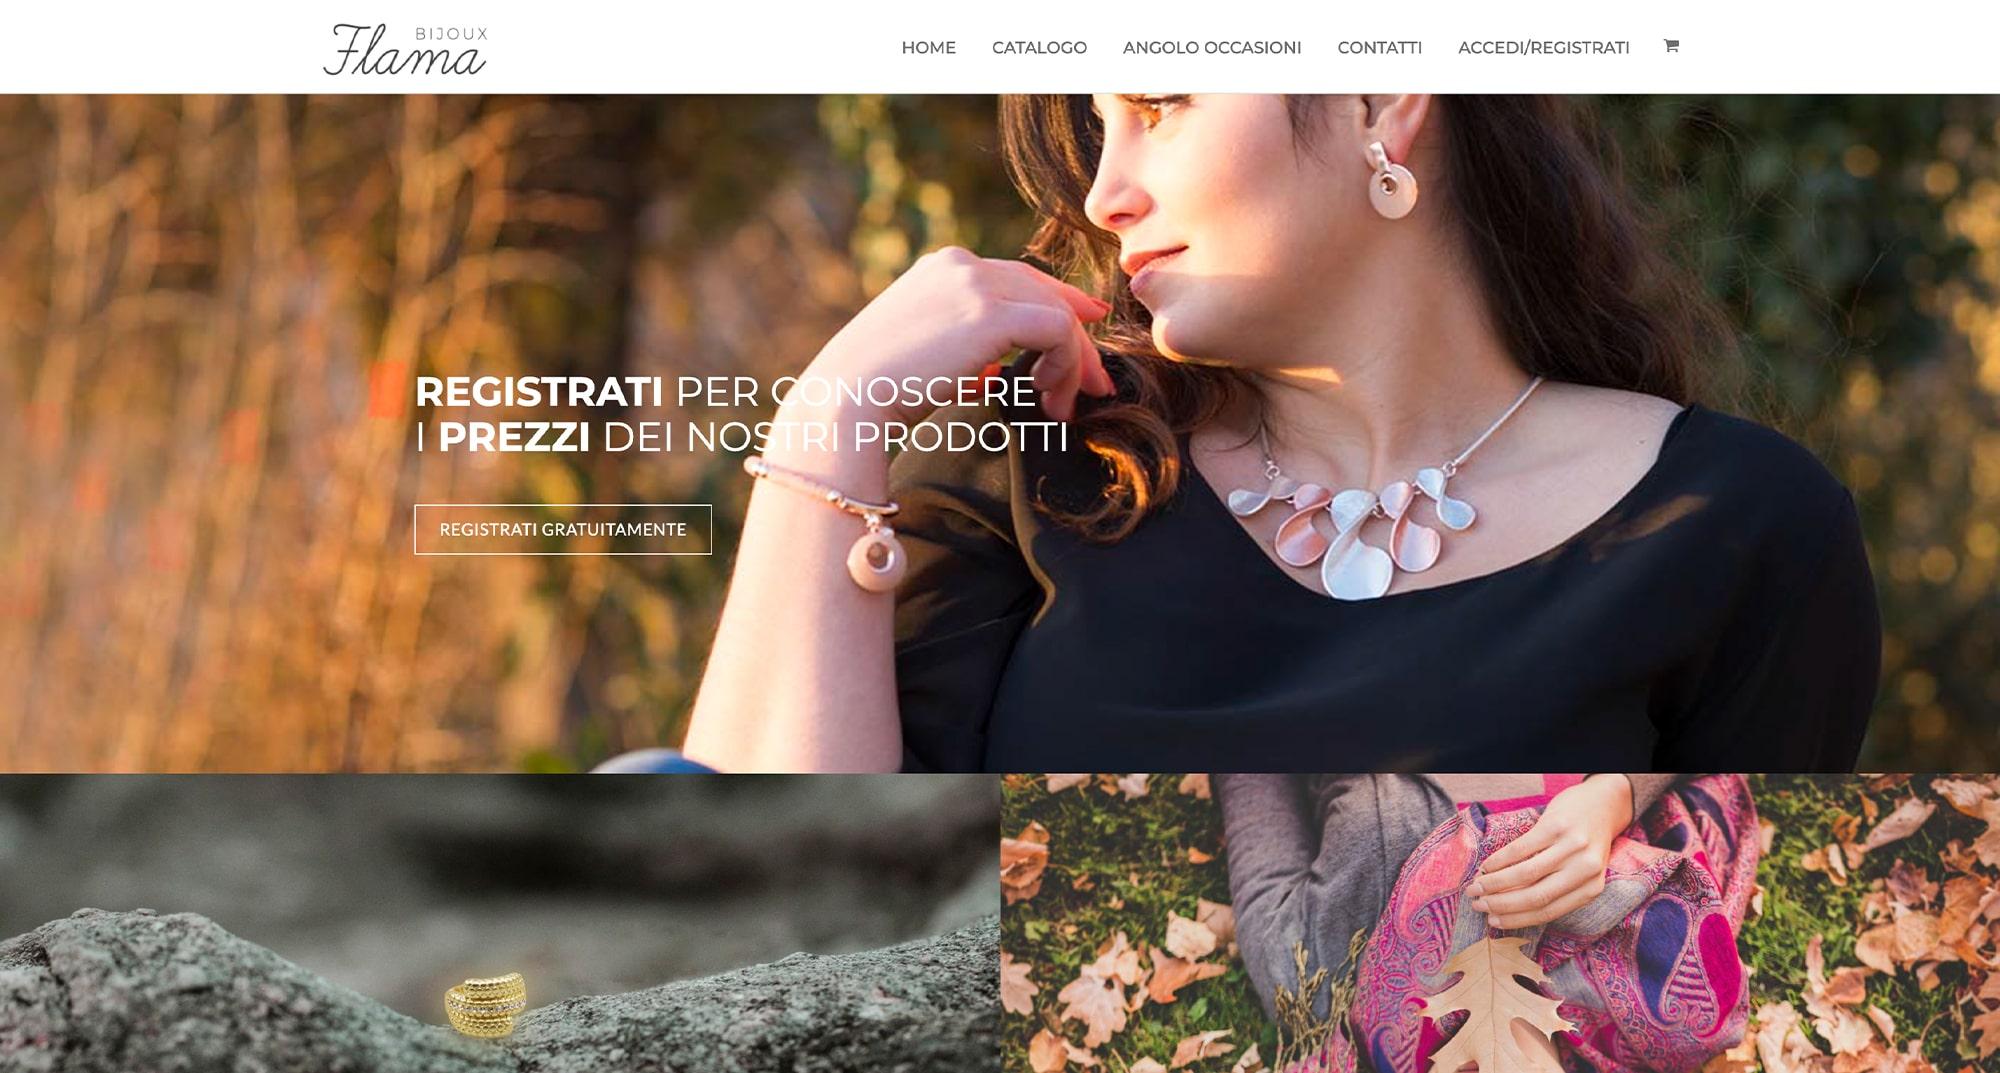 wowcreatives-flama-website-commerce